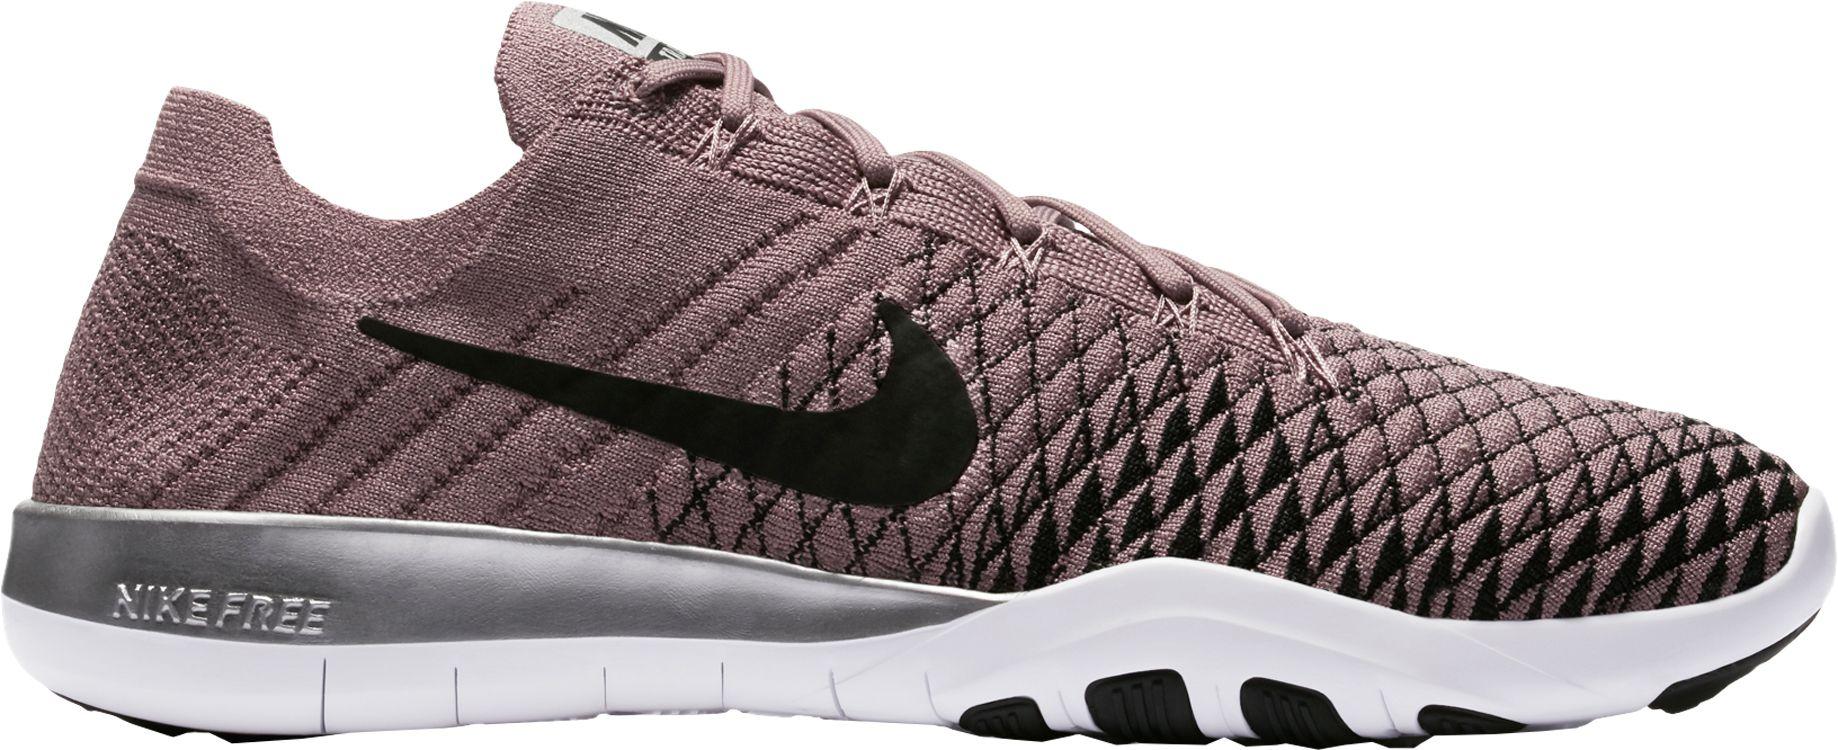 Nike Women's Free TR Flyknit 2 Bionic Training Shoes. 0:00. 0:00 / 0:00.  noImageFound ???